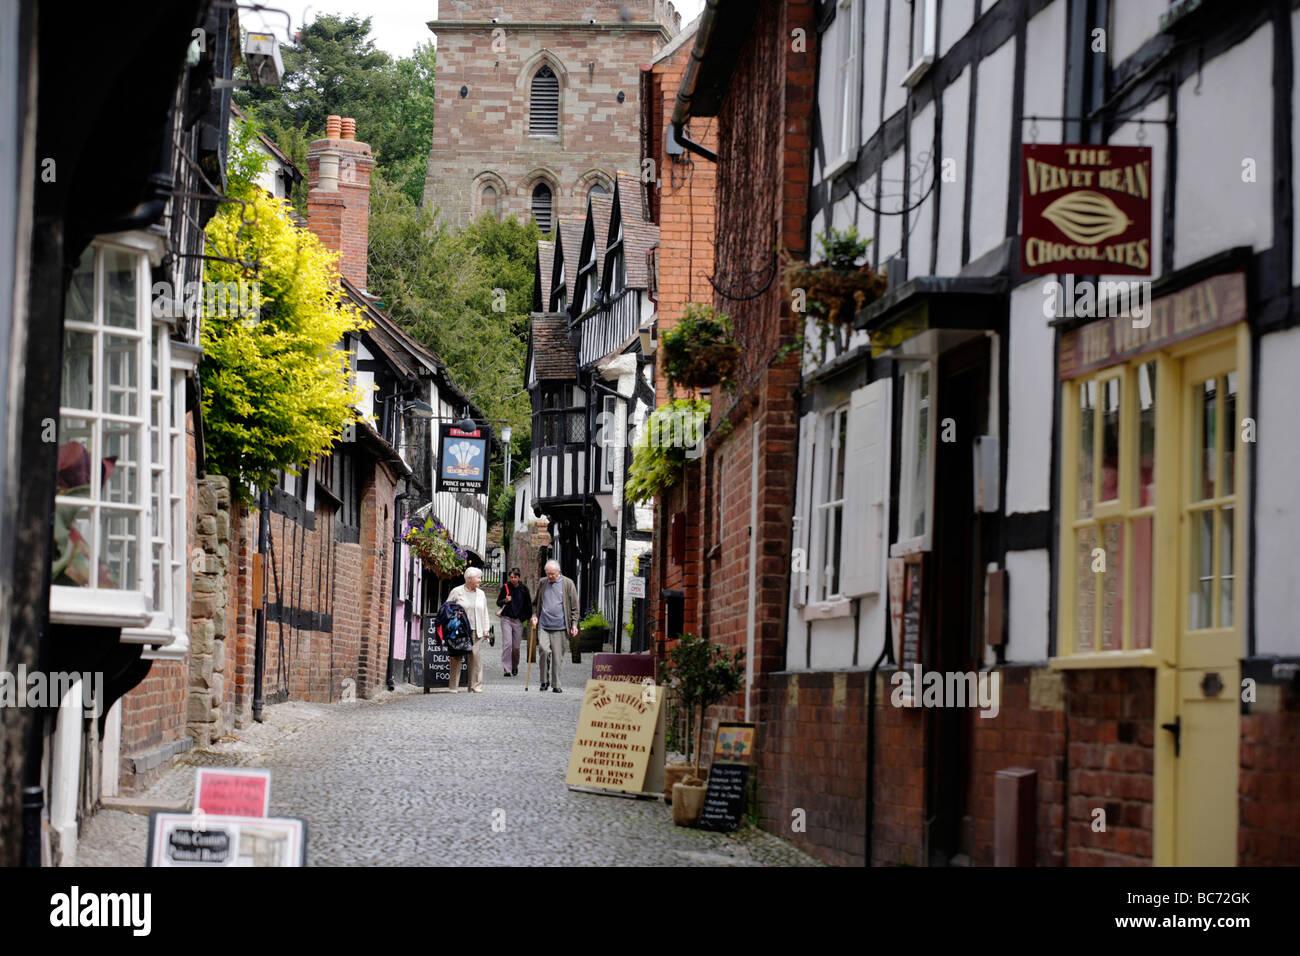 Church Lane en Ledbury, Gloucestershire, Reino Unido Foto de stock